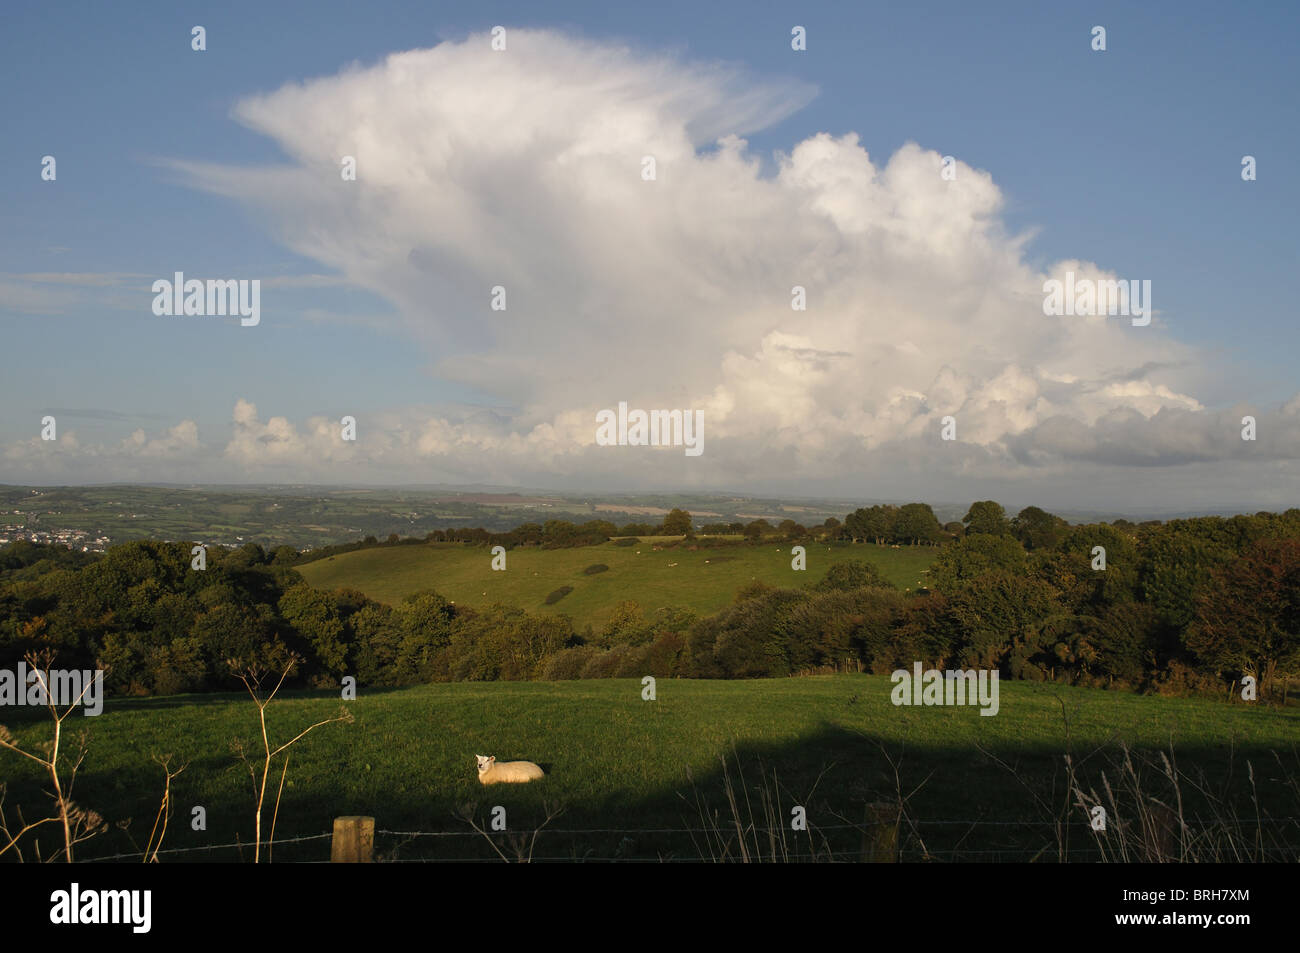 Anvil cumulonimbus cloud over sheep in field, pembrokeshire, wales, united kingdom - Stock Image